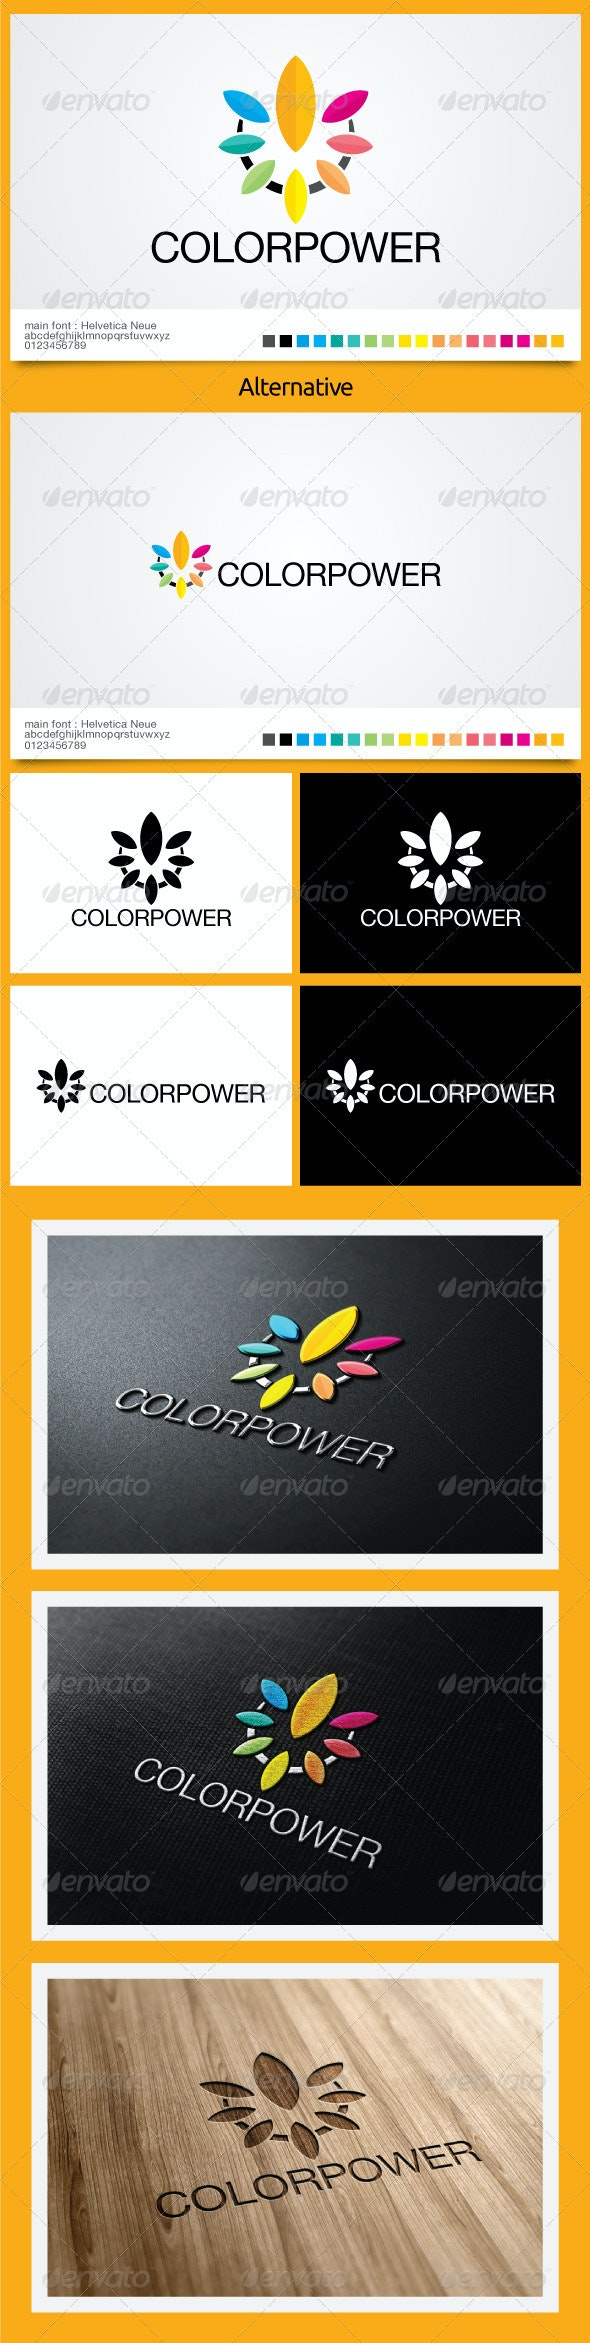 Color Power Logo Template - Symbols Logo Templates